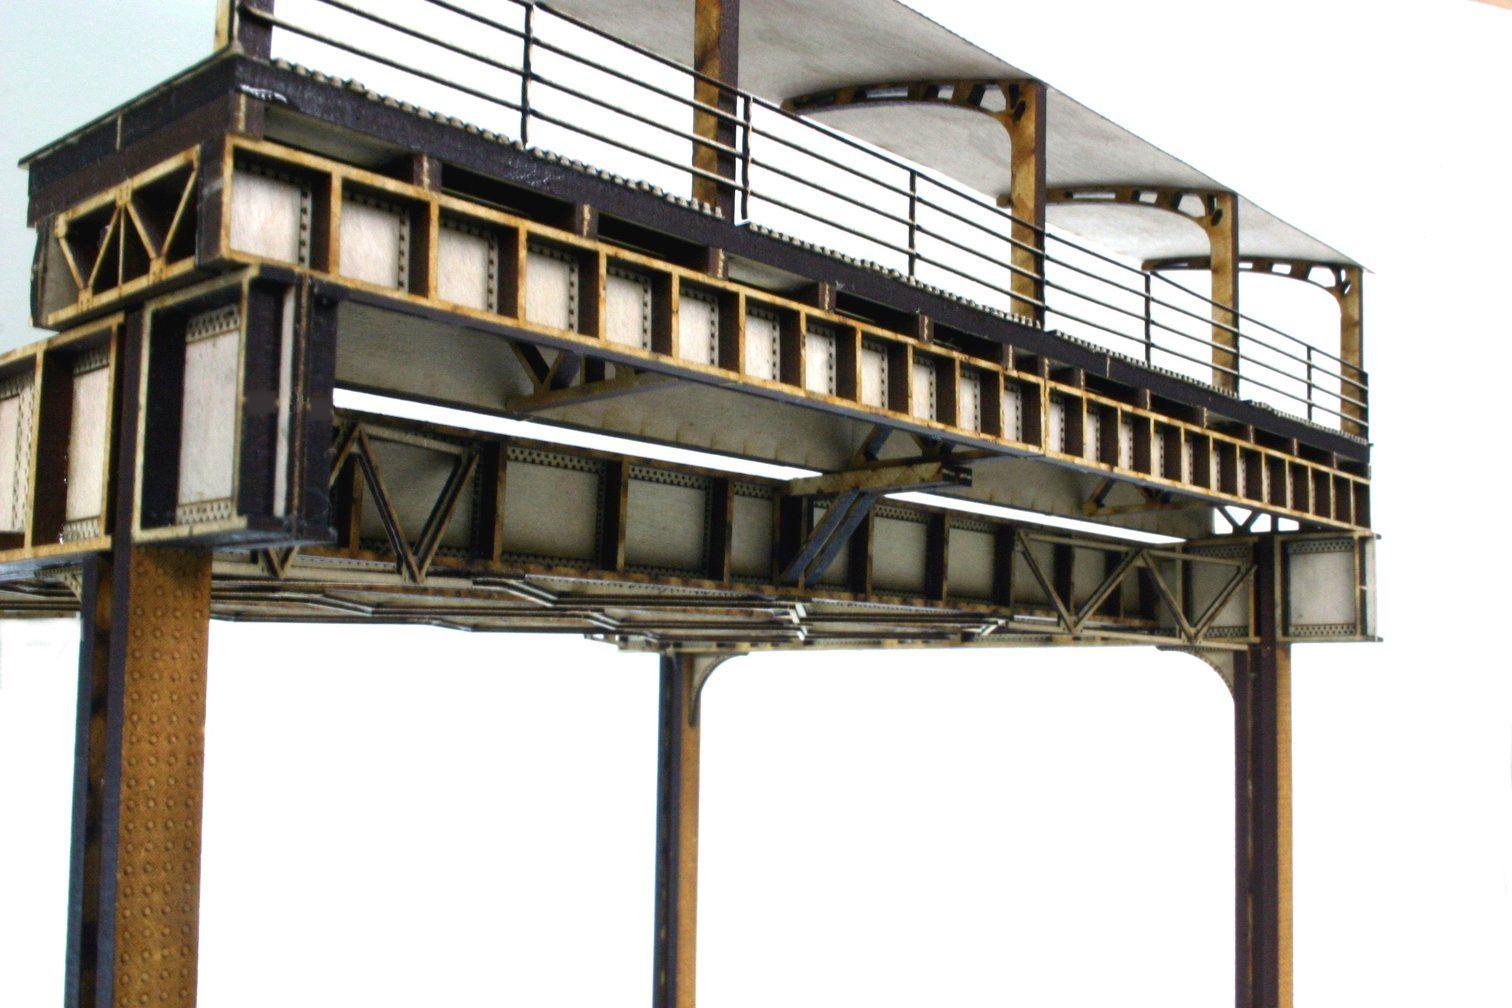 Ho nyc station platform concrete deck steel girder